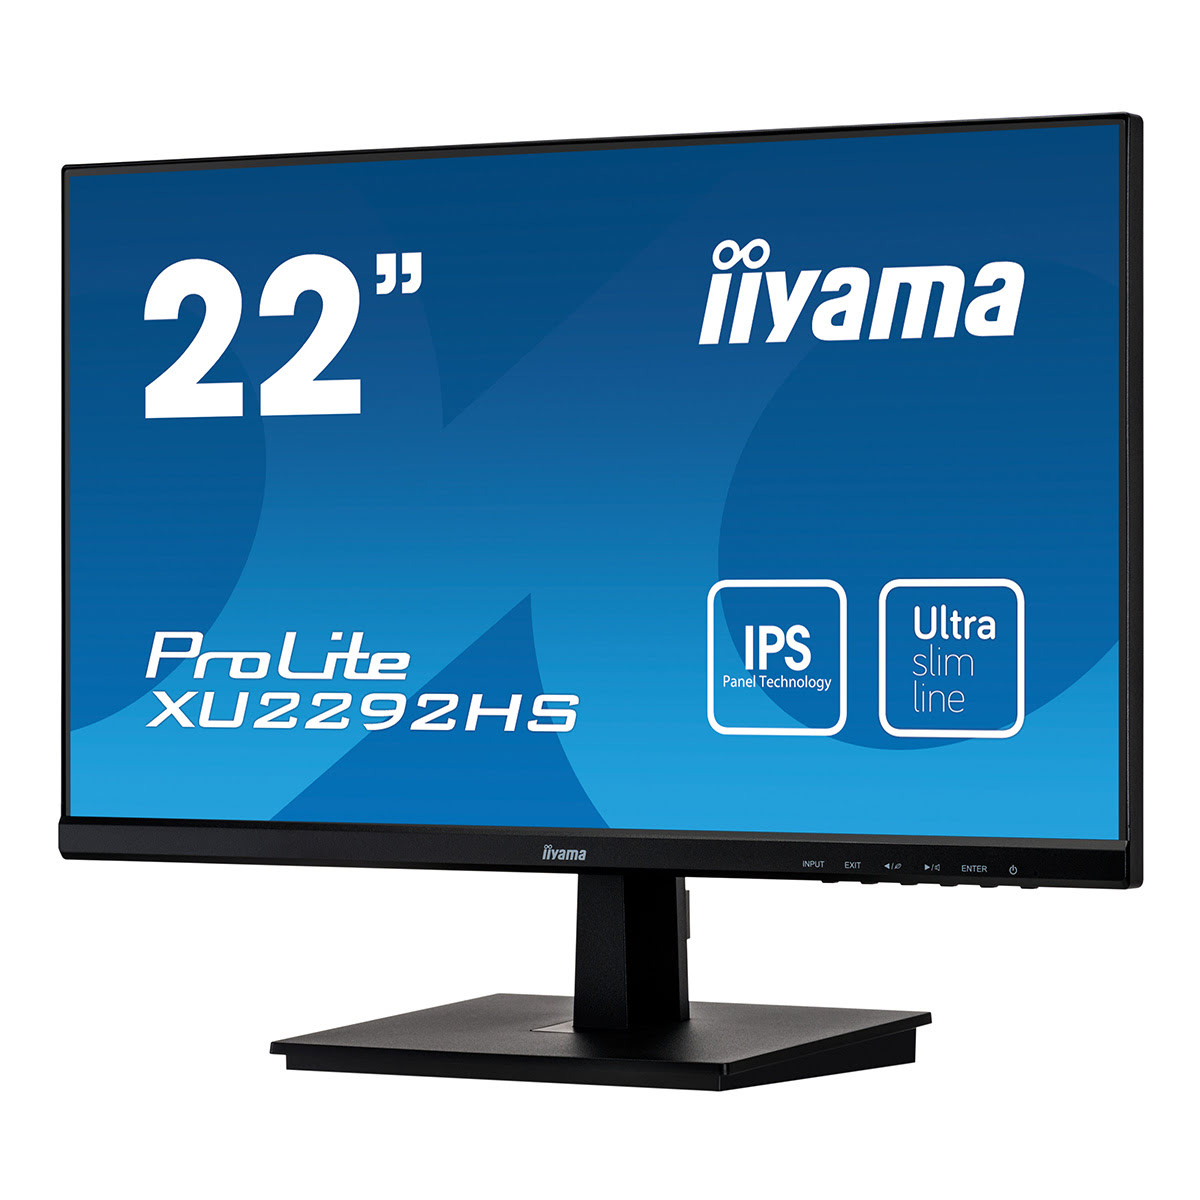 "Iiyama 22""  XU2292HS-B1 - Ecran PC Iiyama - Cybertek.fr - 3"